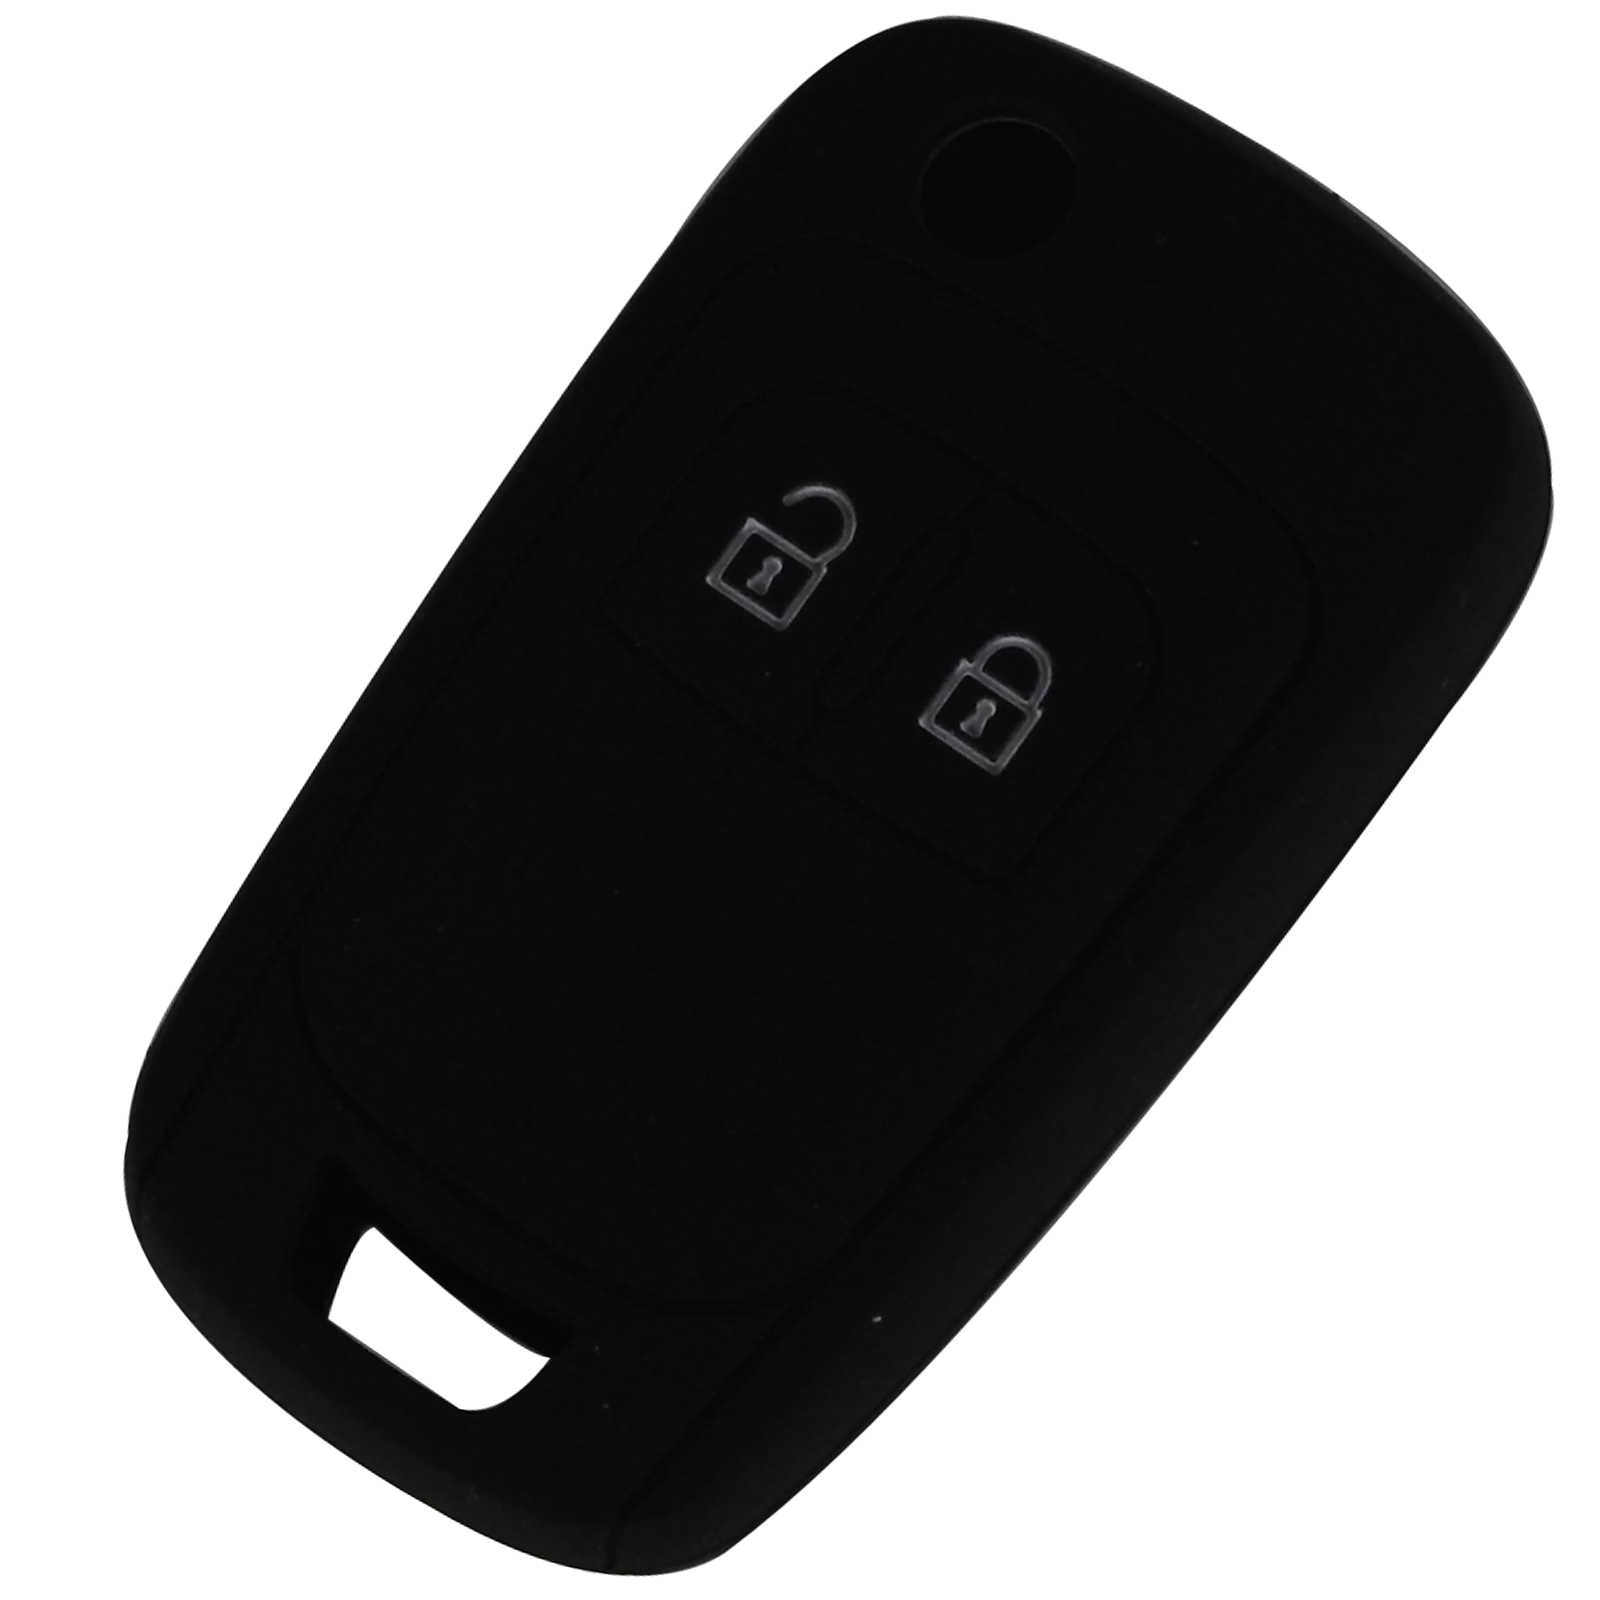 Bilchave 2 ปุ่มรีโมทซิลิโคนพับรถฝาครอบสำหรับ Chevrolet Cruze ผู้ถือ Key Protector